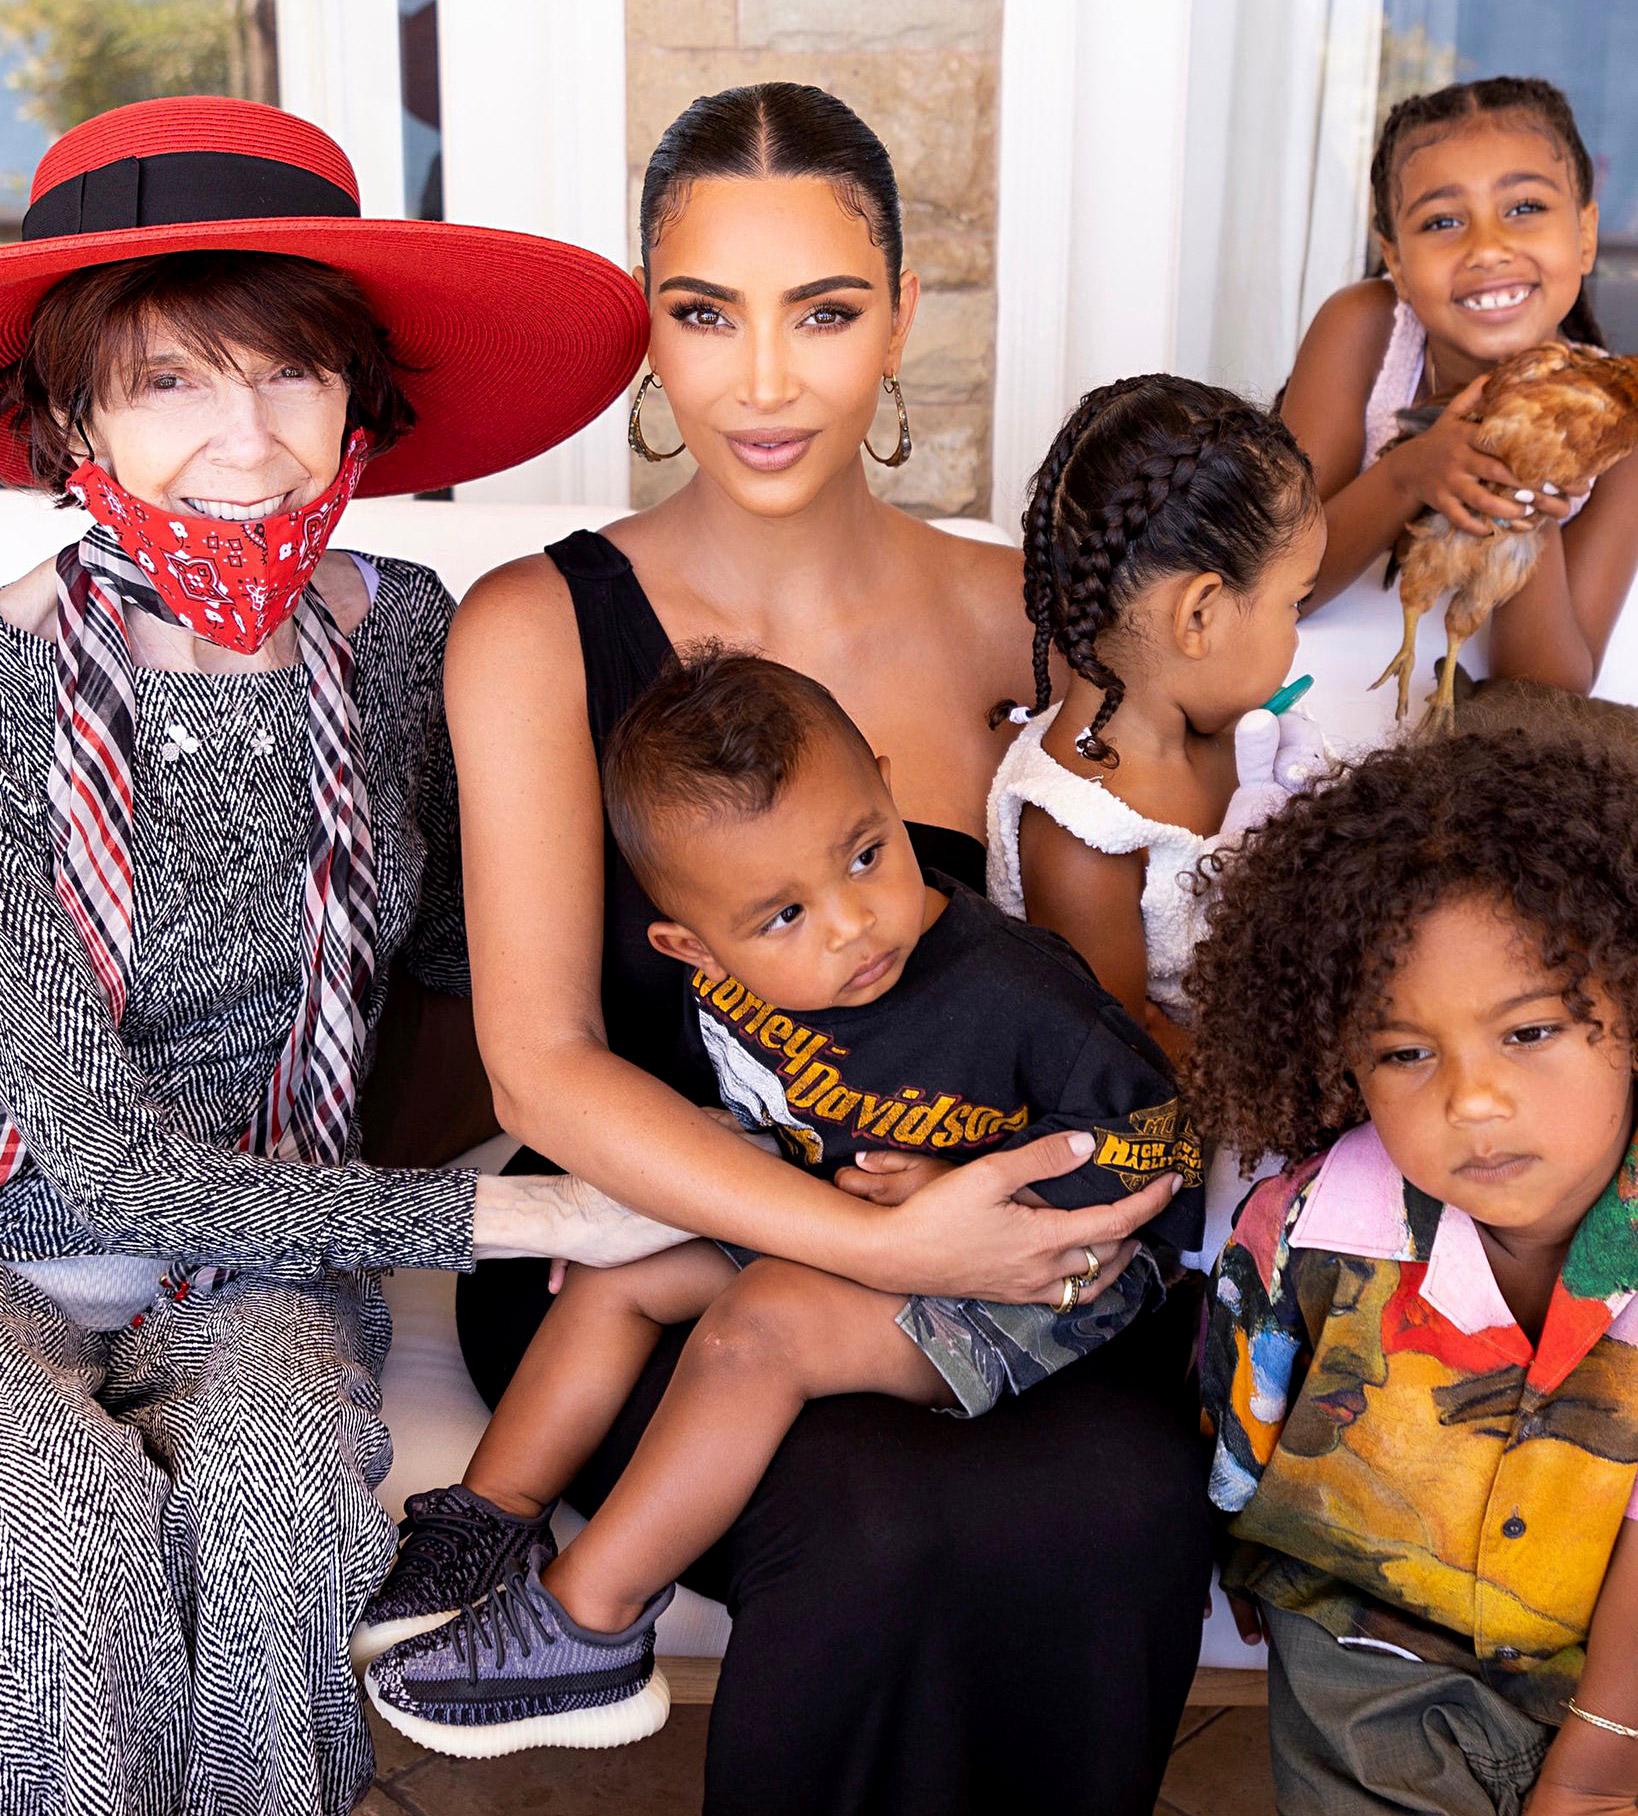 Kim Kardashian, Kanye Wests Sweetest Moments With Their Kids